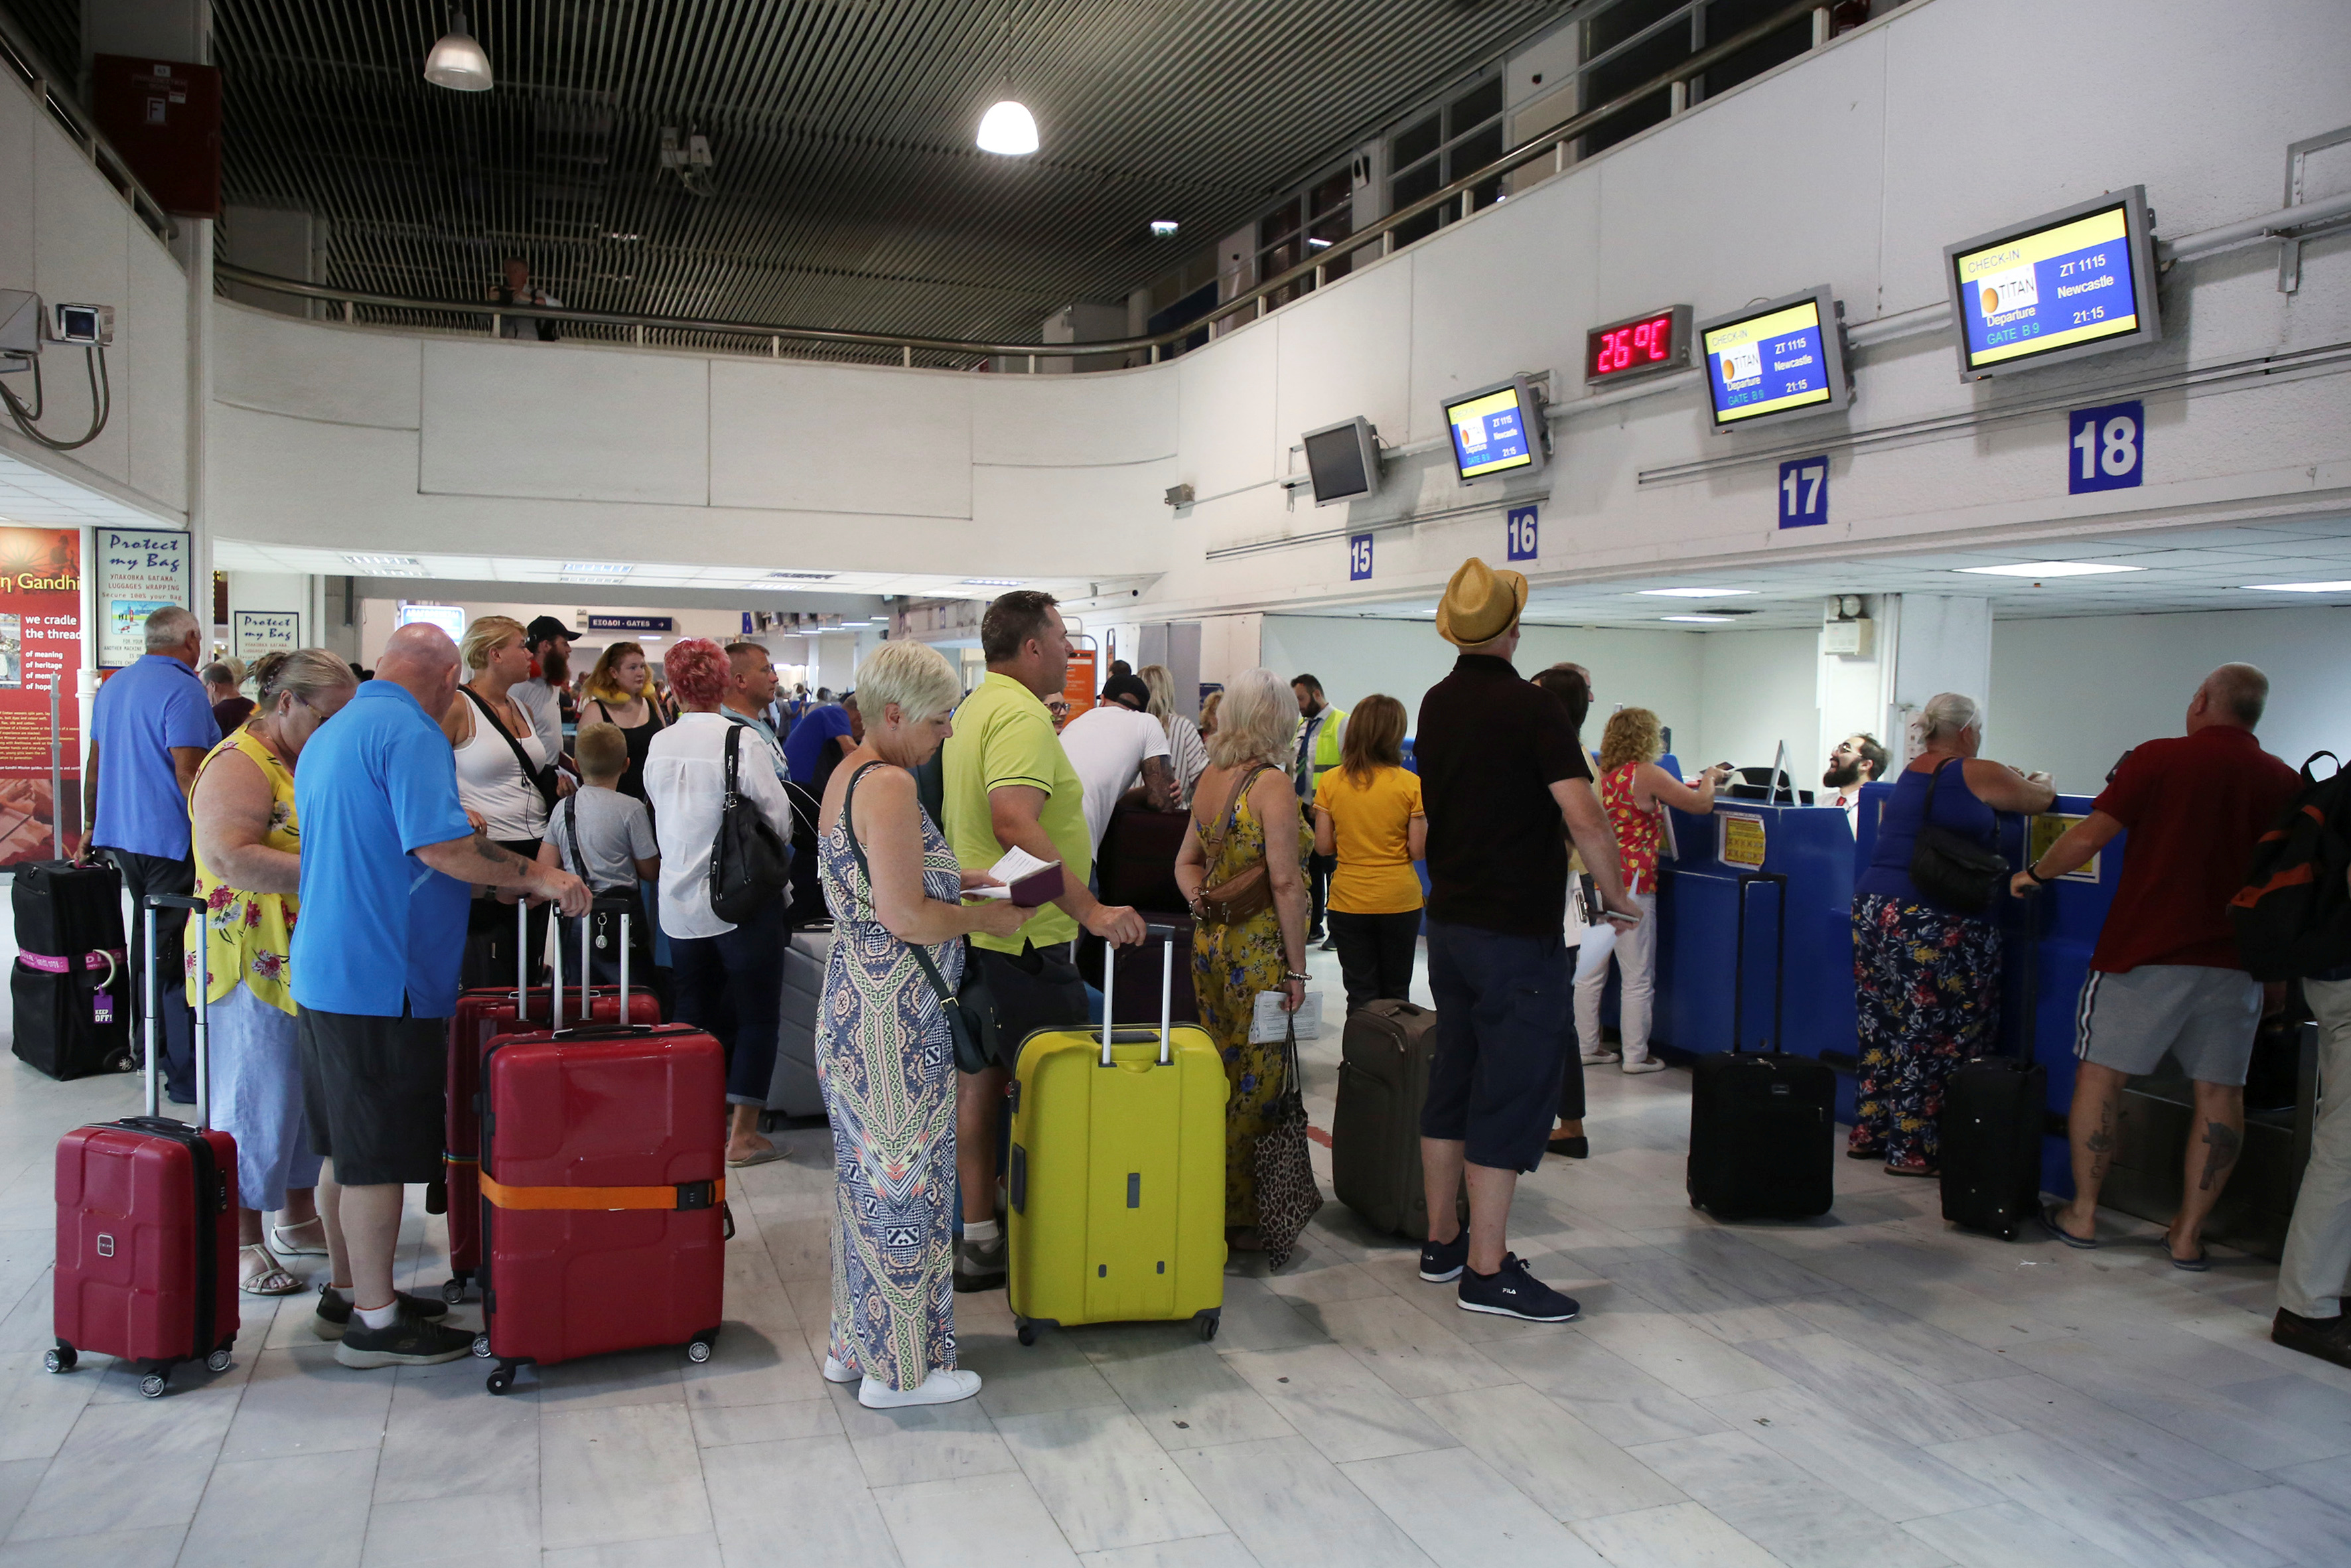 UK to repatriate 16,700 Thomas Cook customers on Saturday